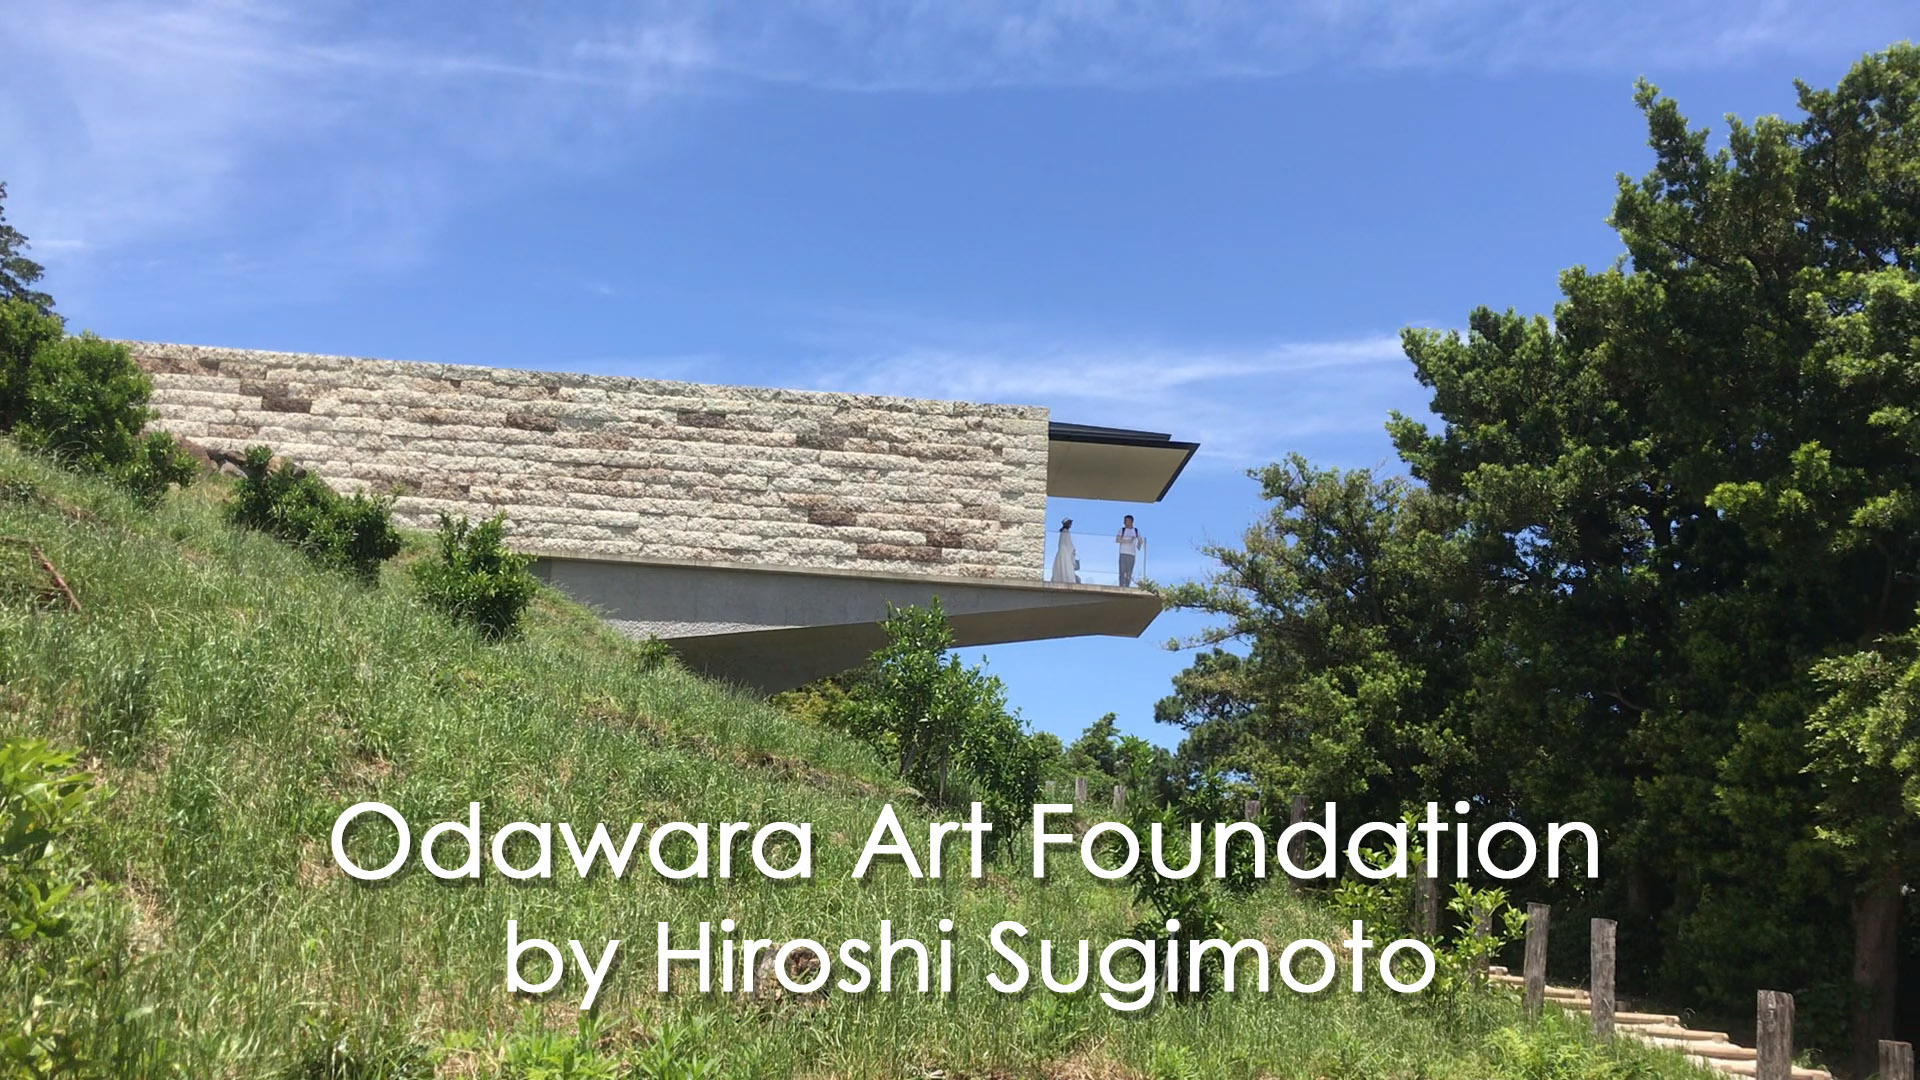 Odawara Art Foundation by Hiroshi Sugimoto